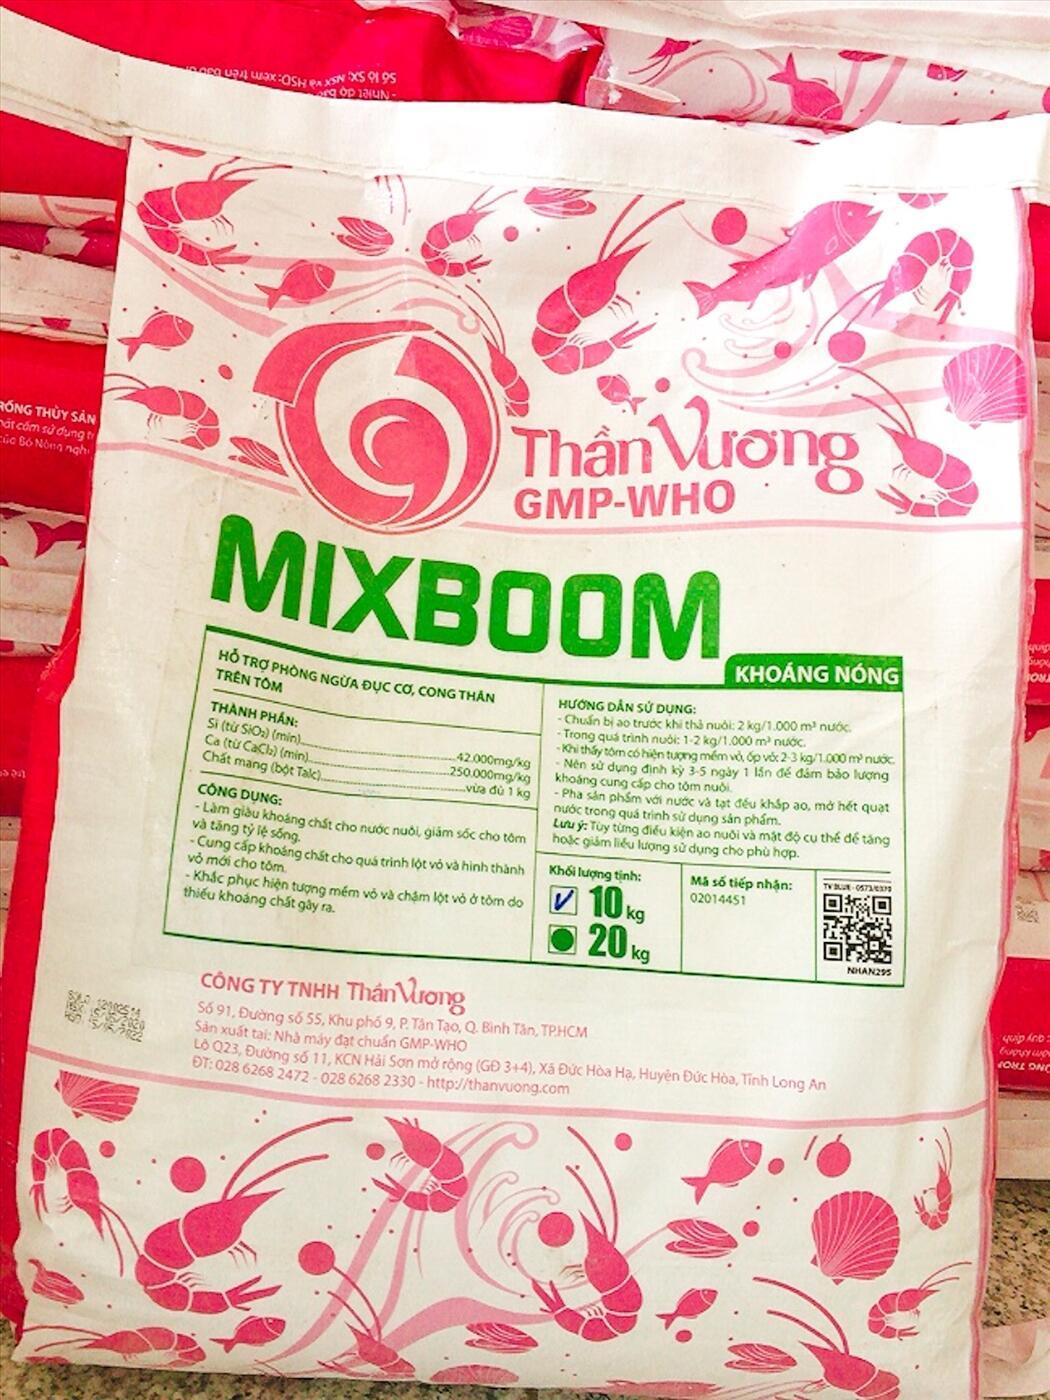 MIXBOOM Khoáng Nóng